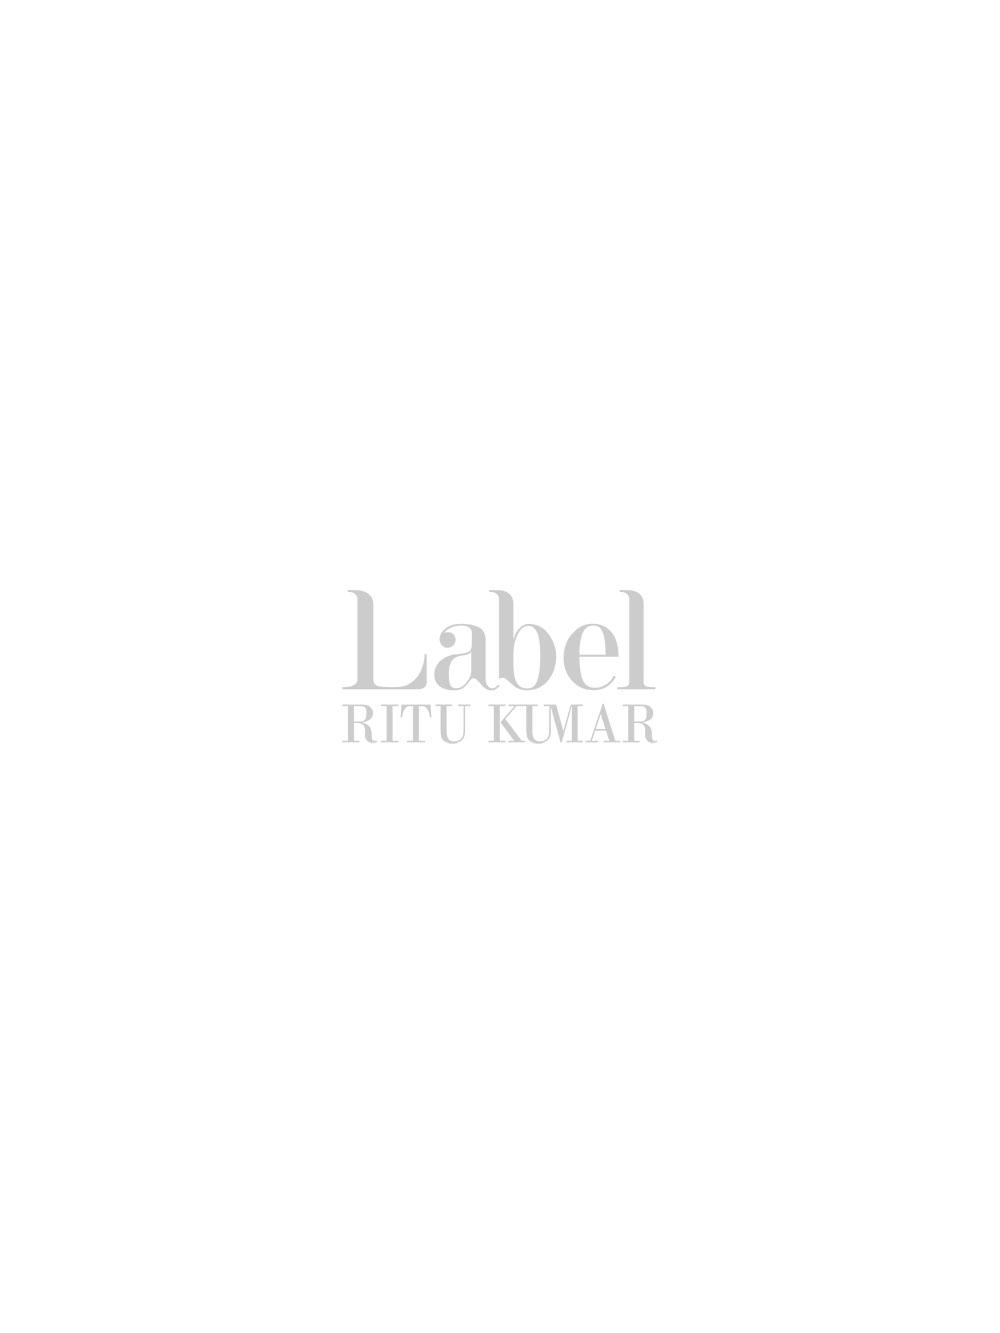 Coral Georgette Tie-Up Short Dress